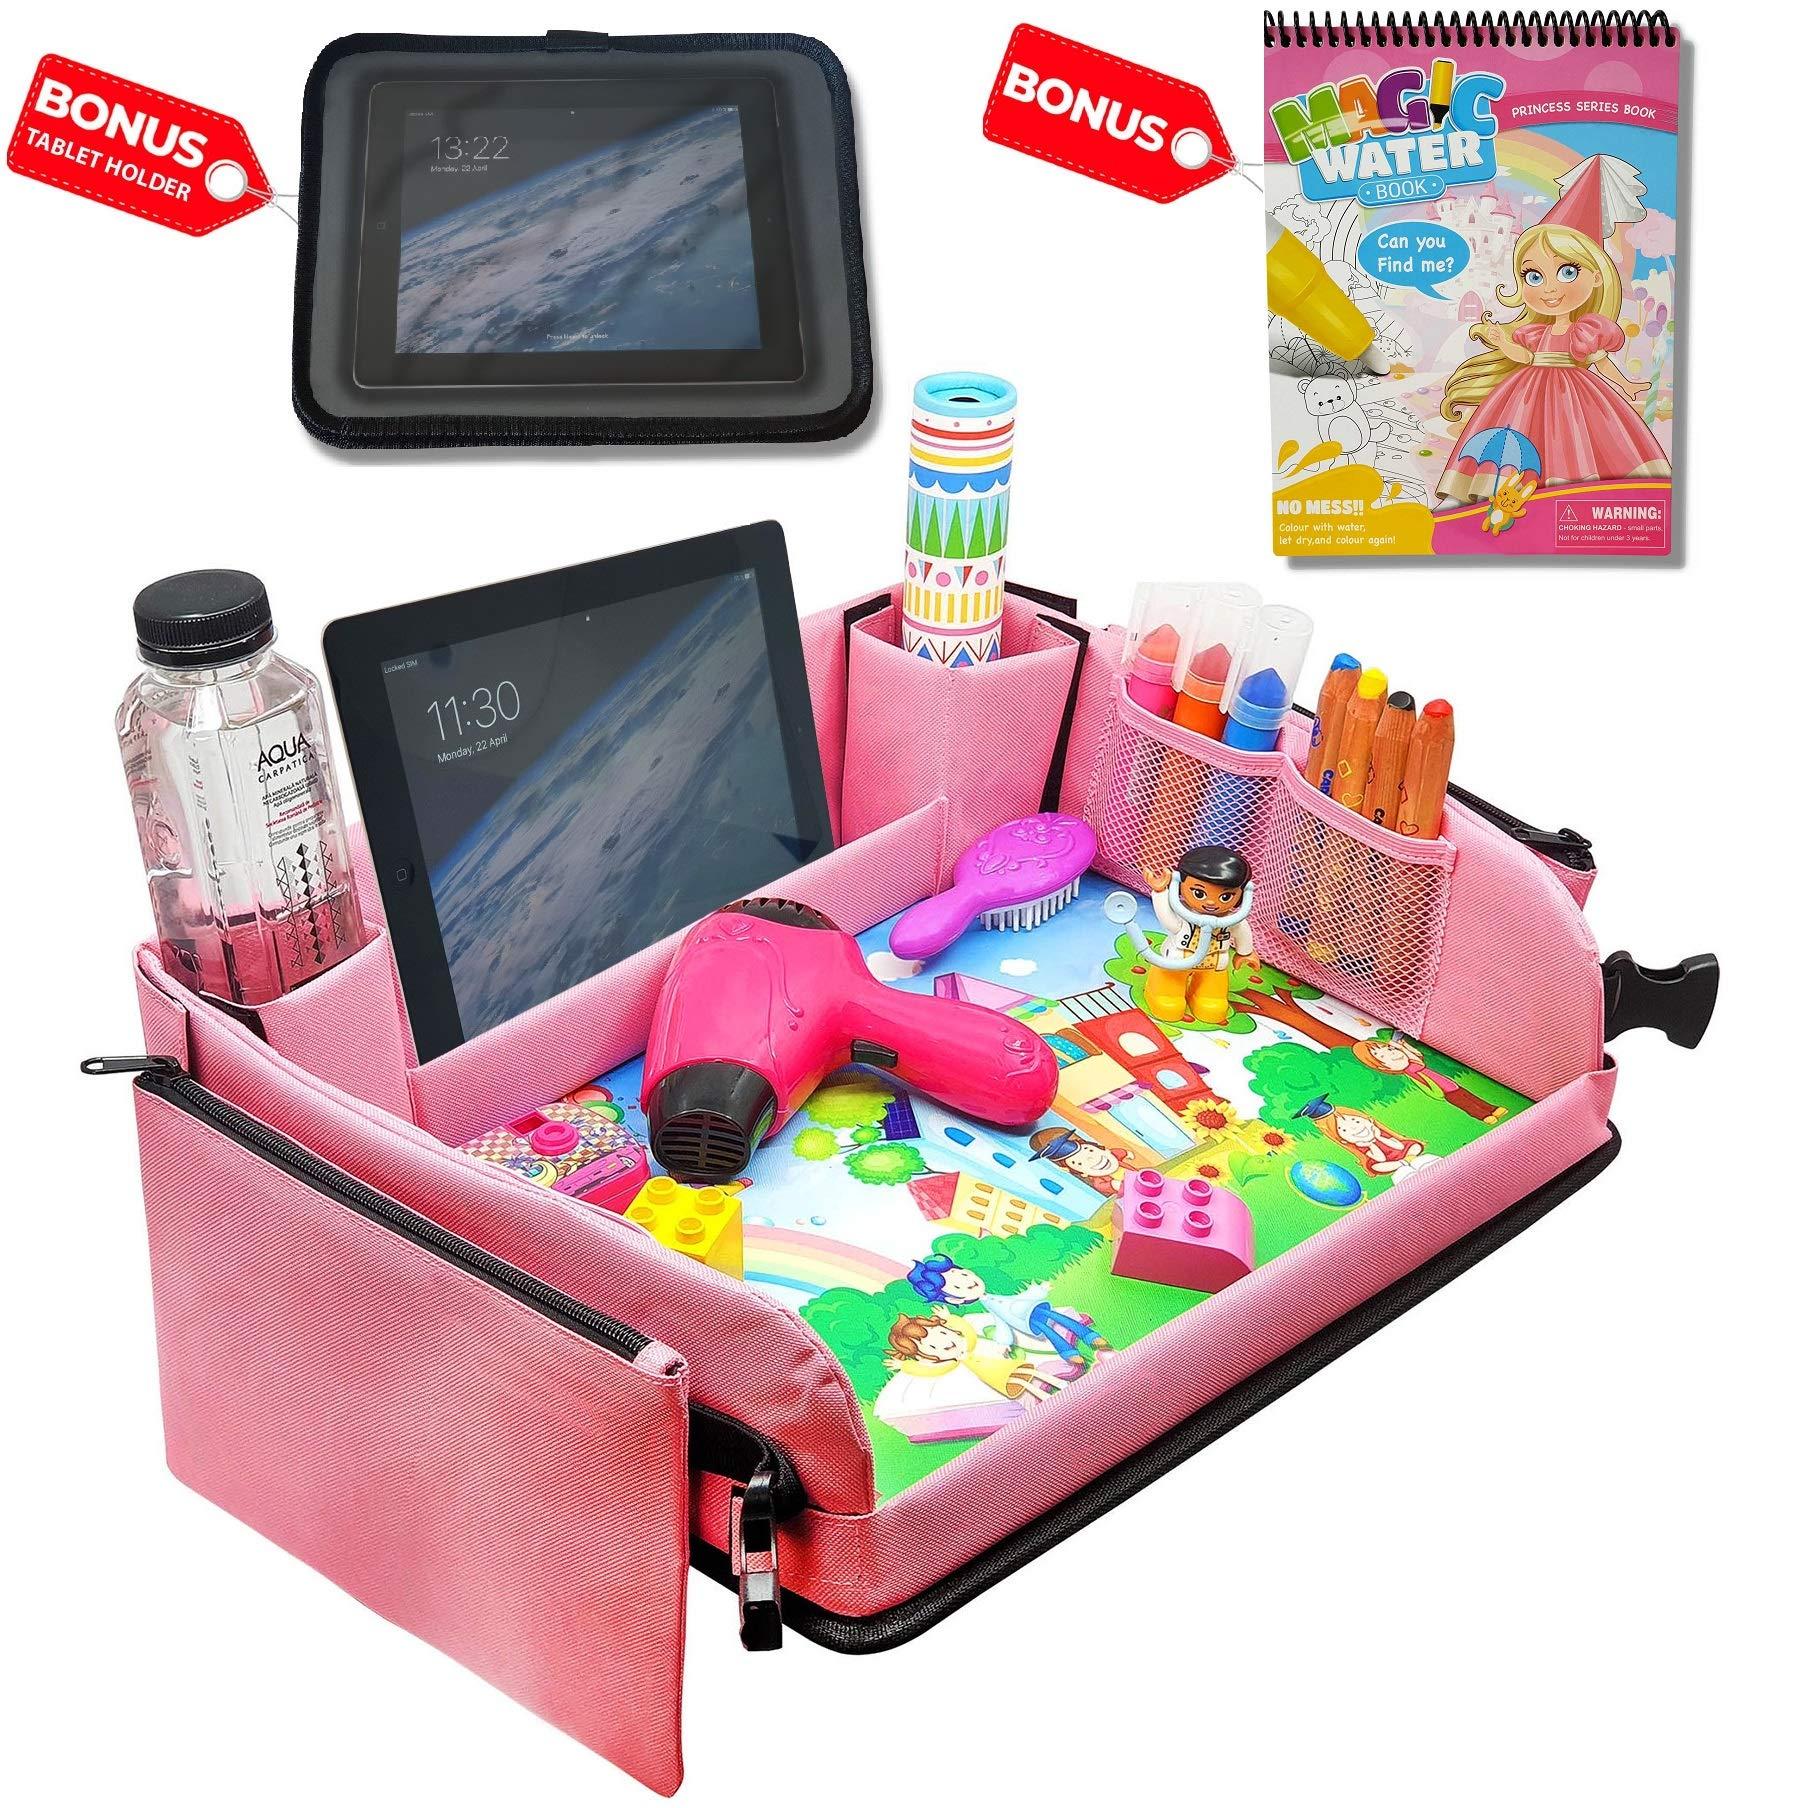 Kids Car Seat Travel Tray (Pink) + Bonus Water Coloring Book + Bonus Car Headrest Tablet Holder  Activity & Stroller Lap Tray by KIDSMARTER